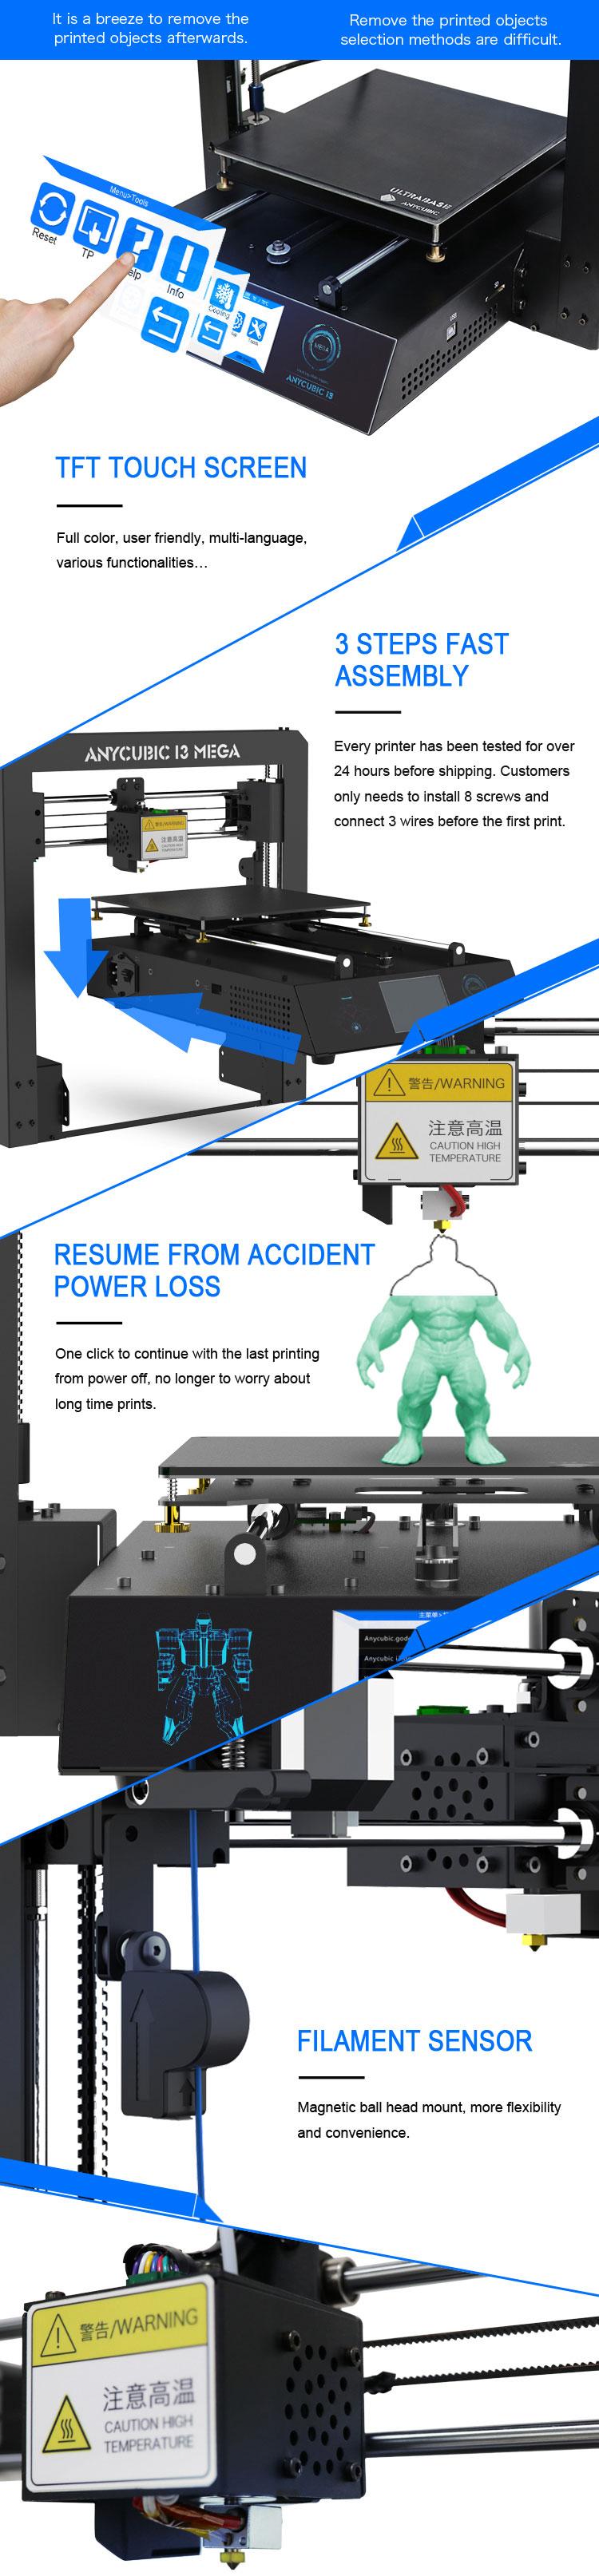 Anycubic 3D printer impresora 3d I3 Mega full metal imprimante 3d High Precision Patented Lattice Platform 3d printer kit (3)